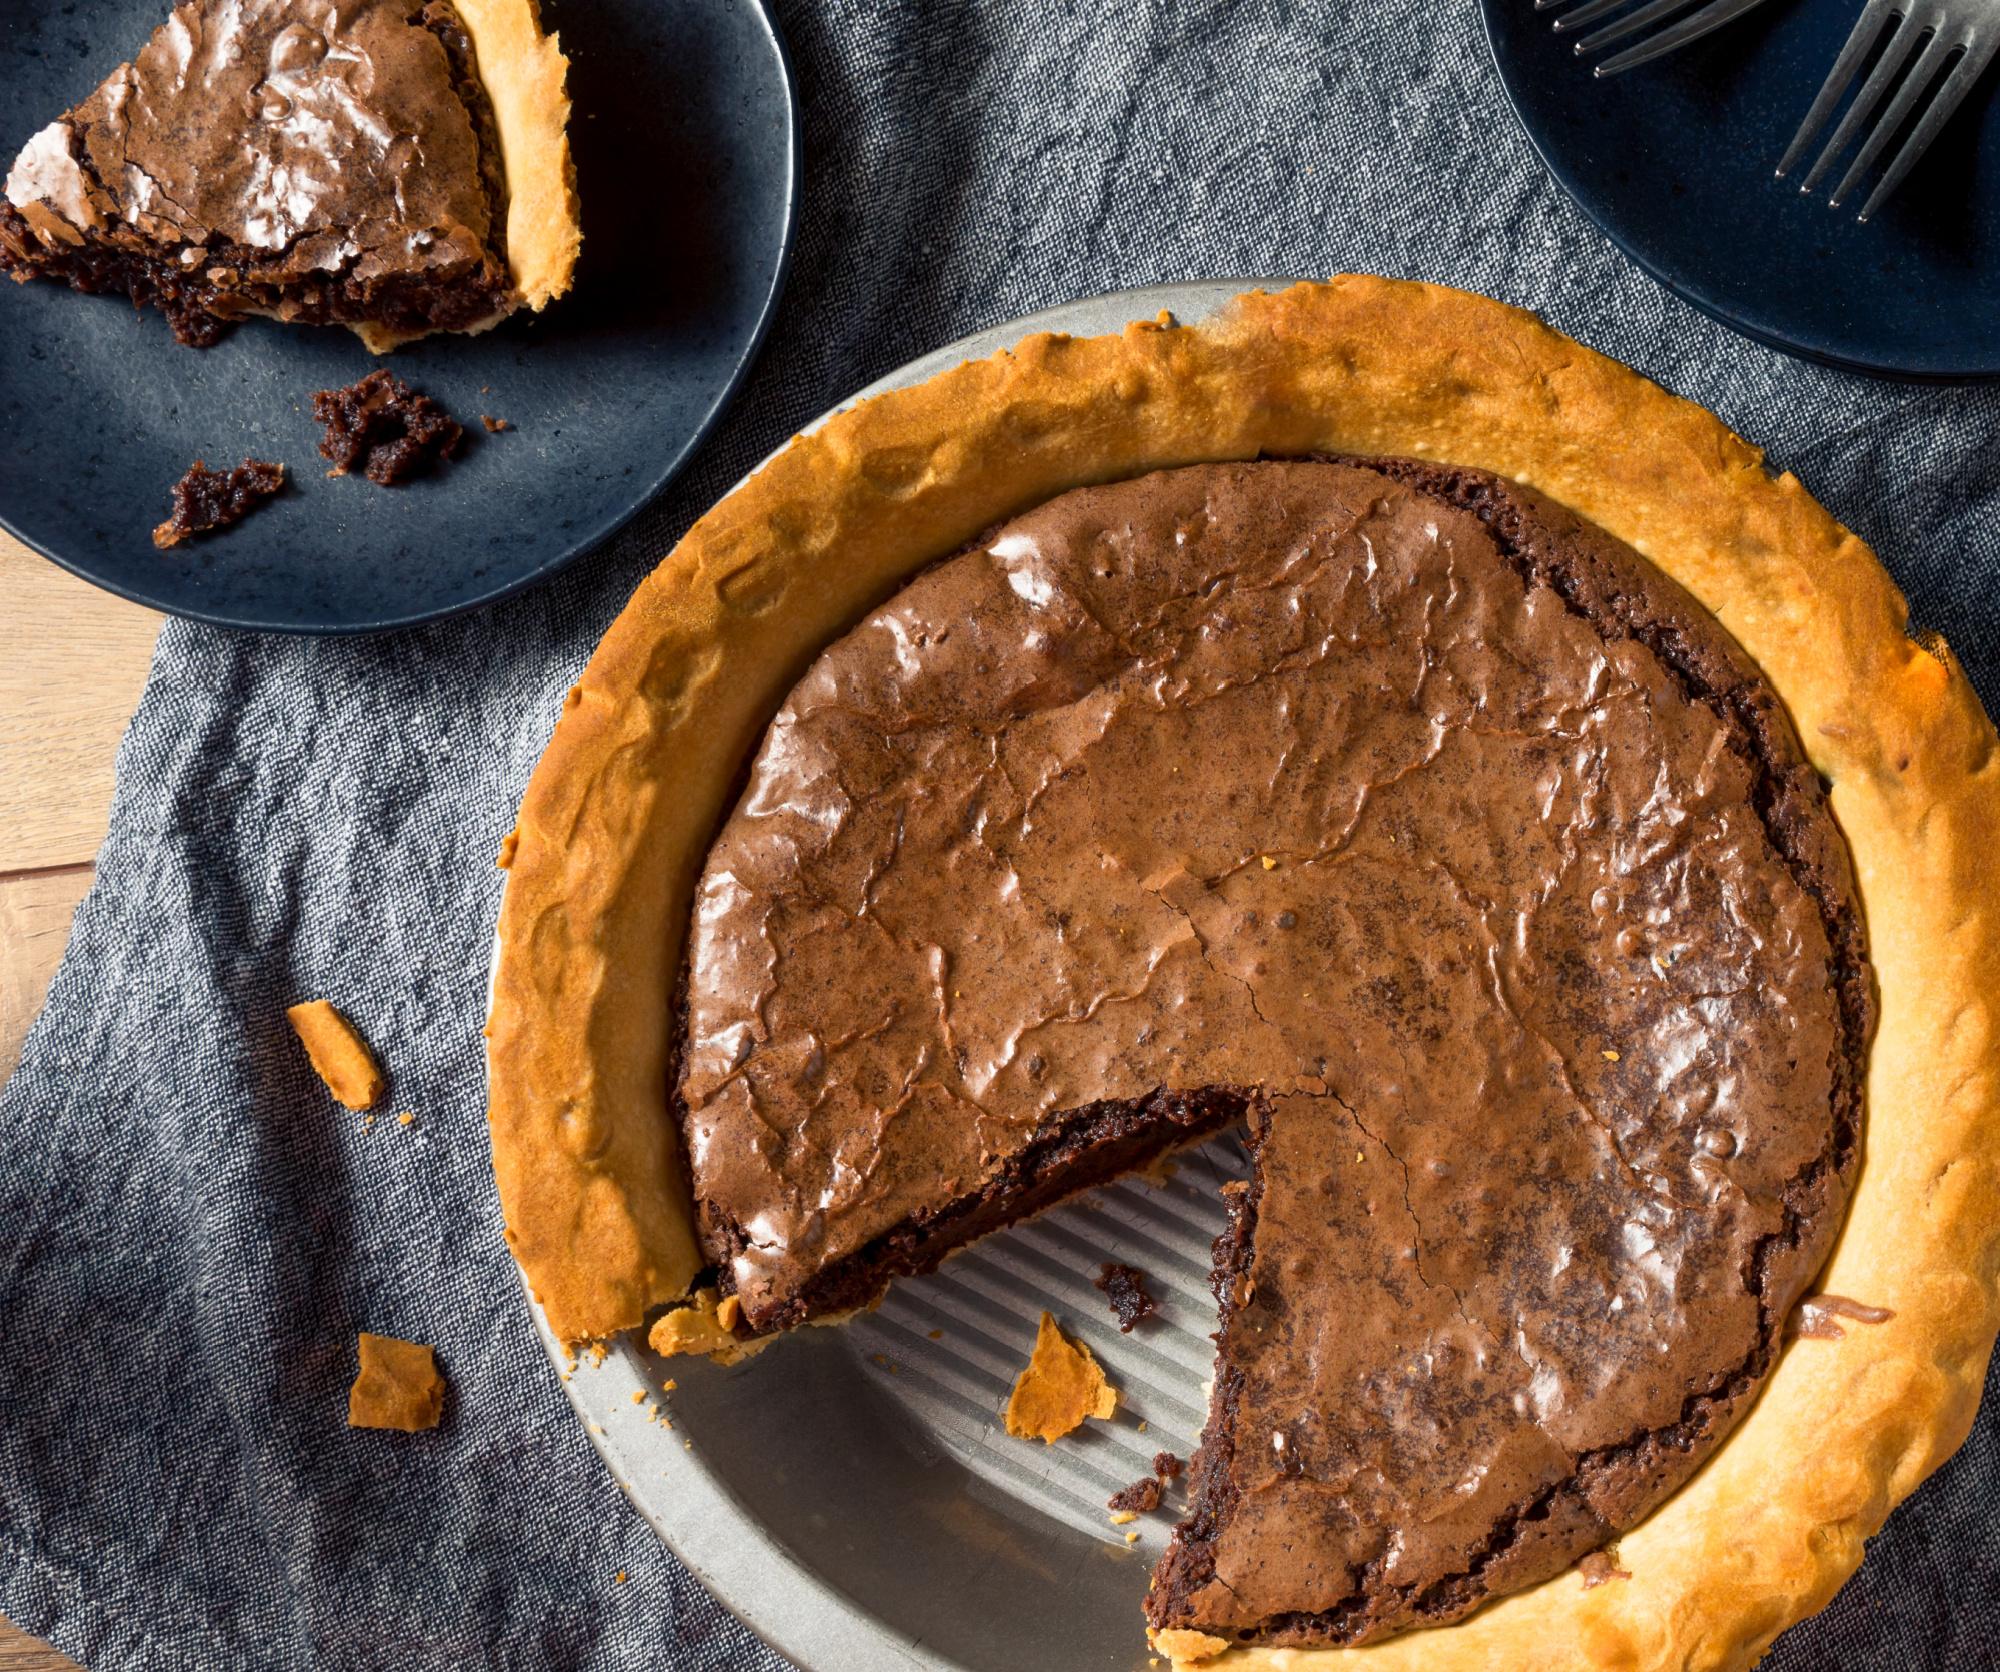 Keto fudge pie sliced and ready to enjoy